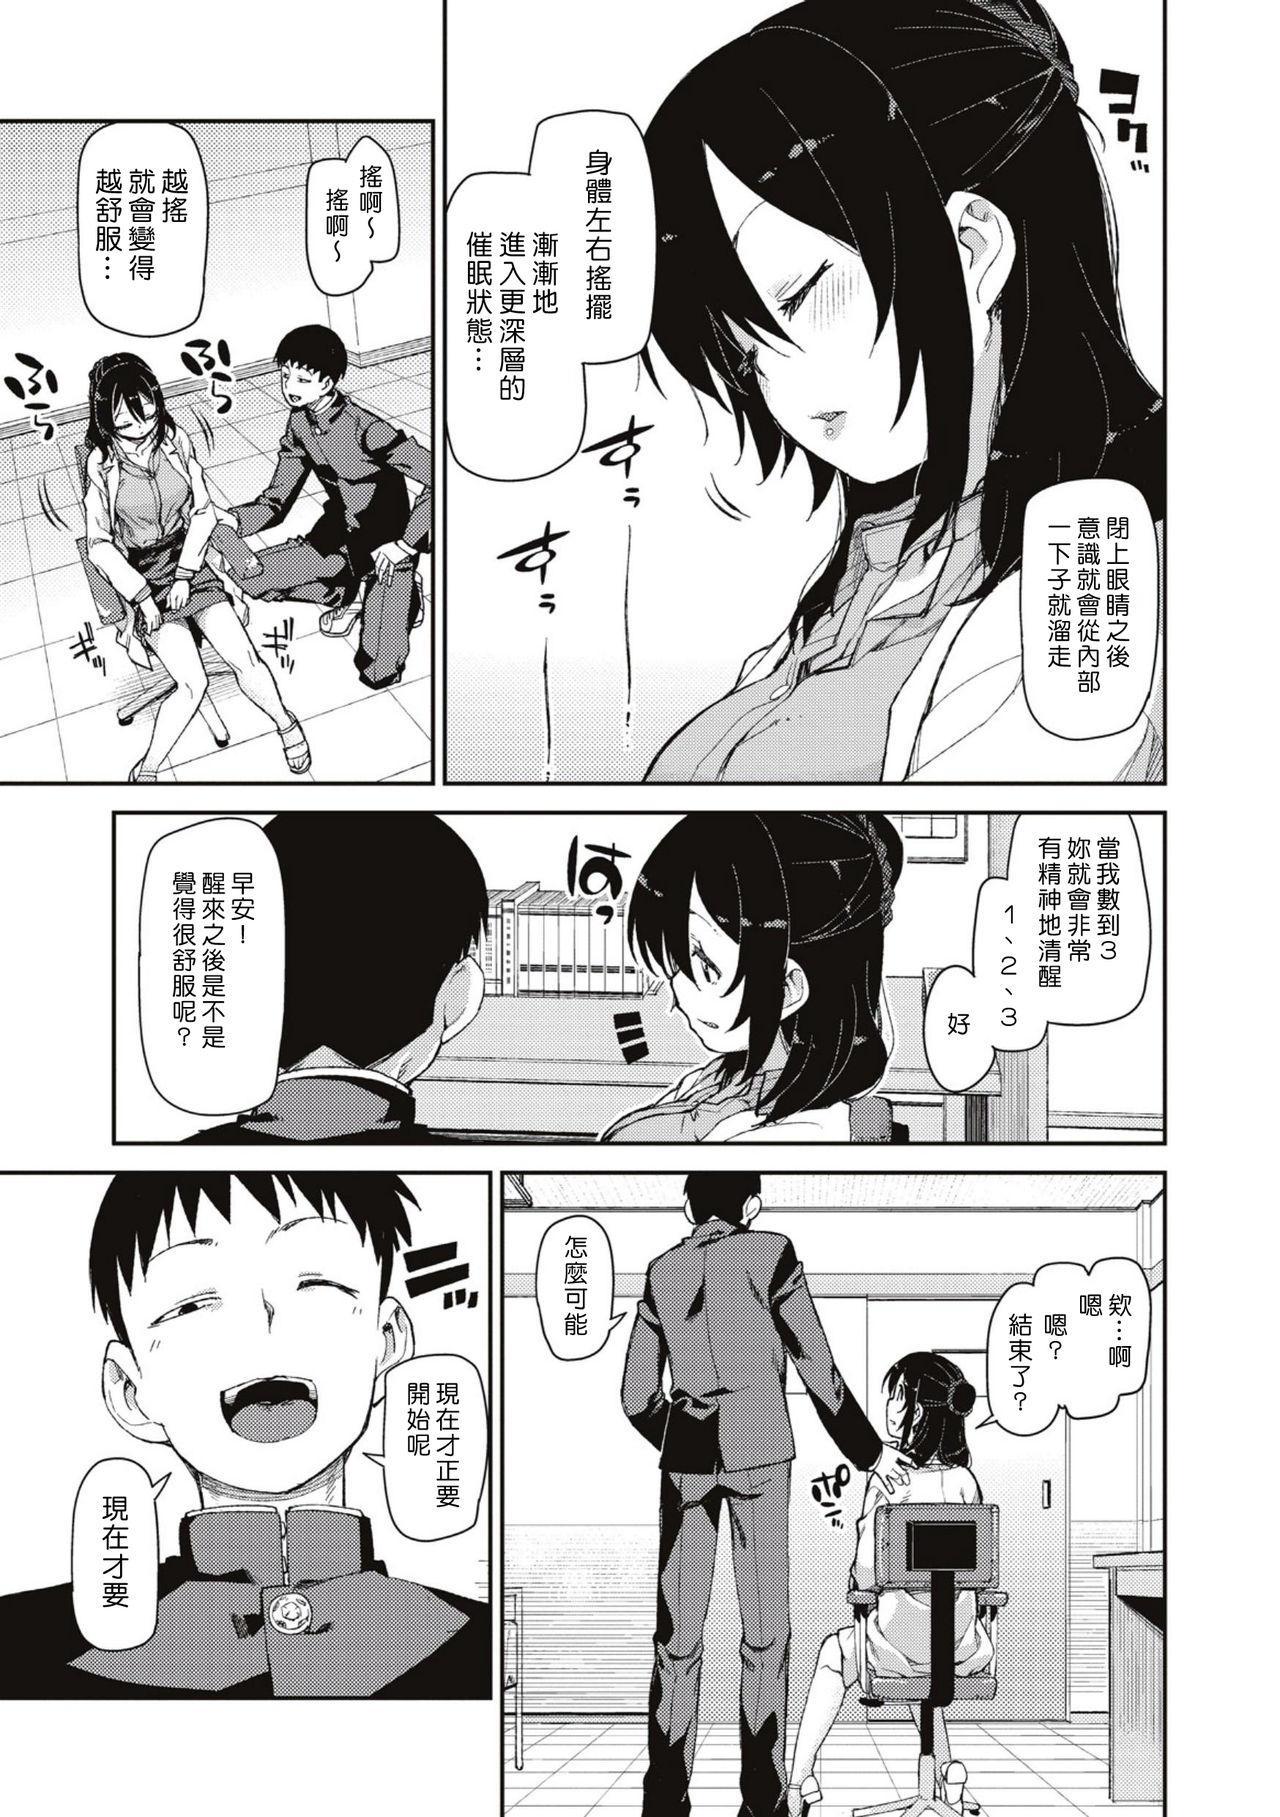 Himitsu no onedari 4